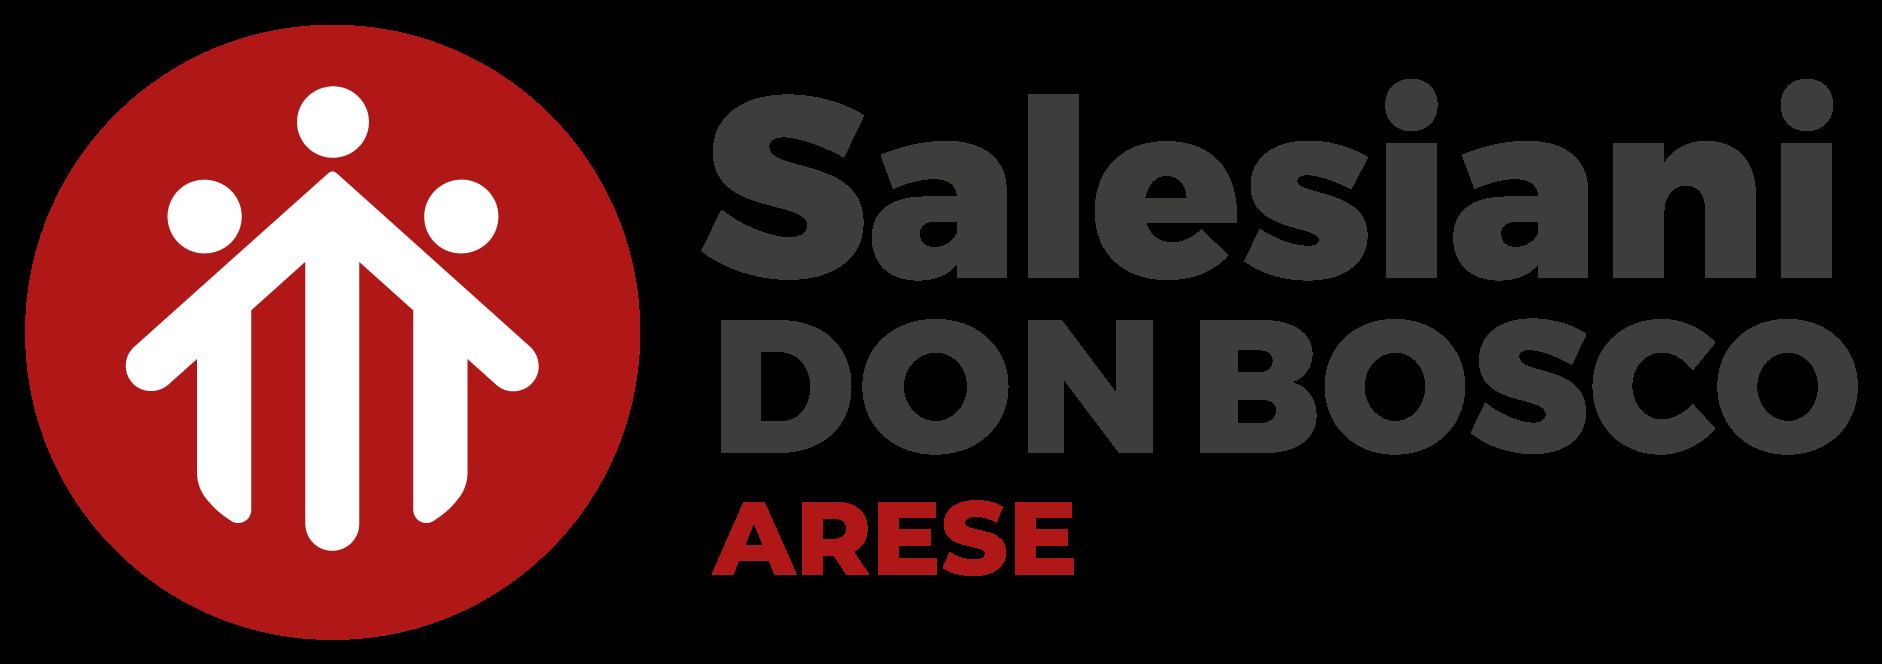 Salesiani Don Bosco Arese